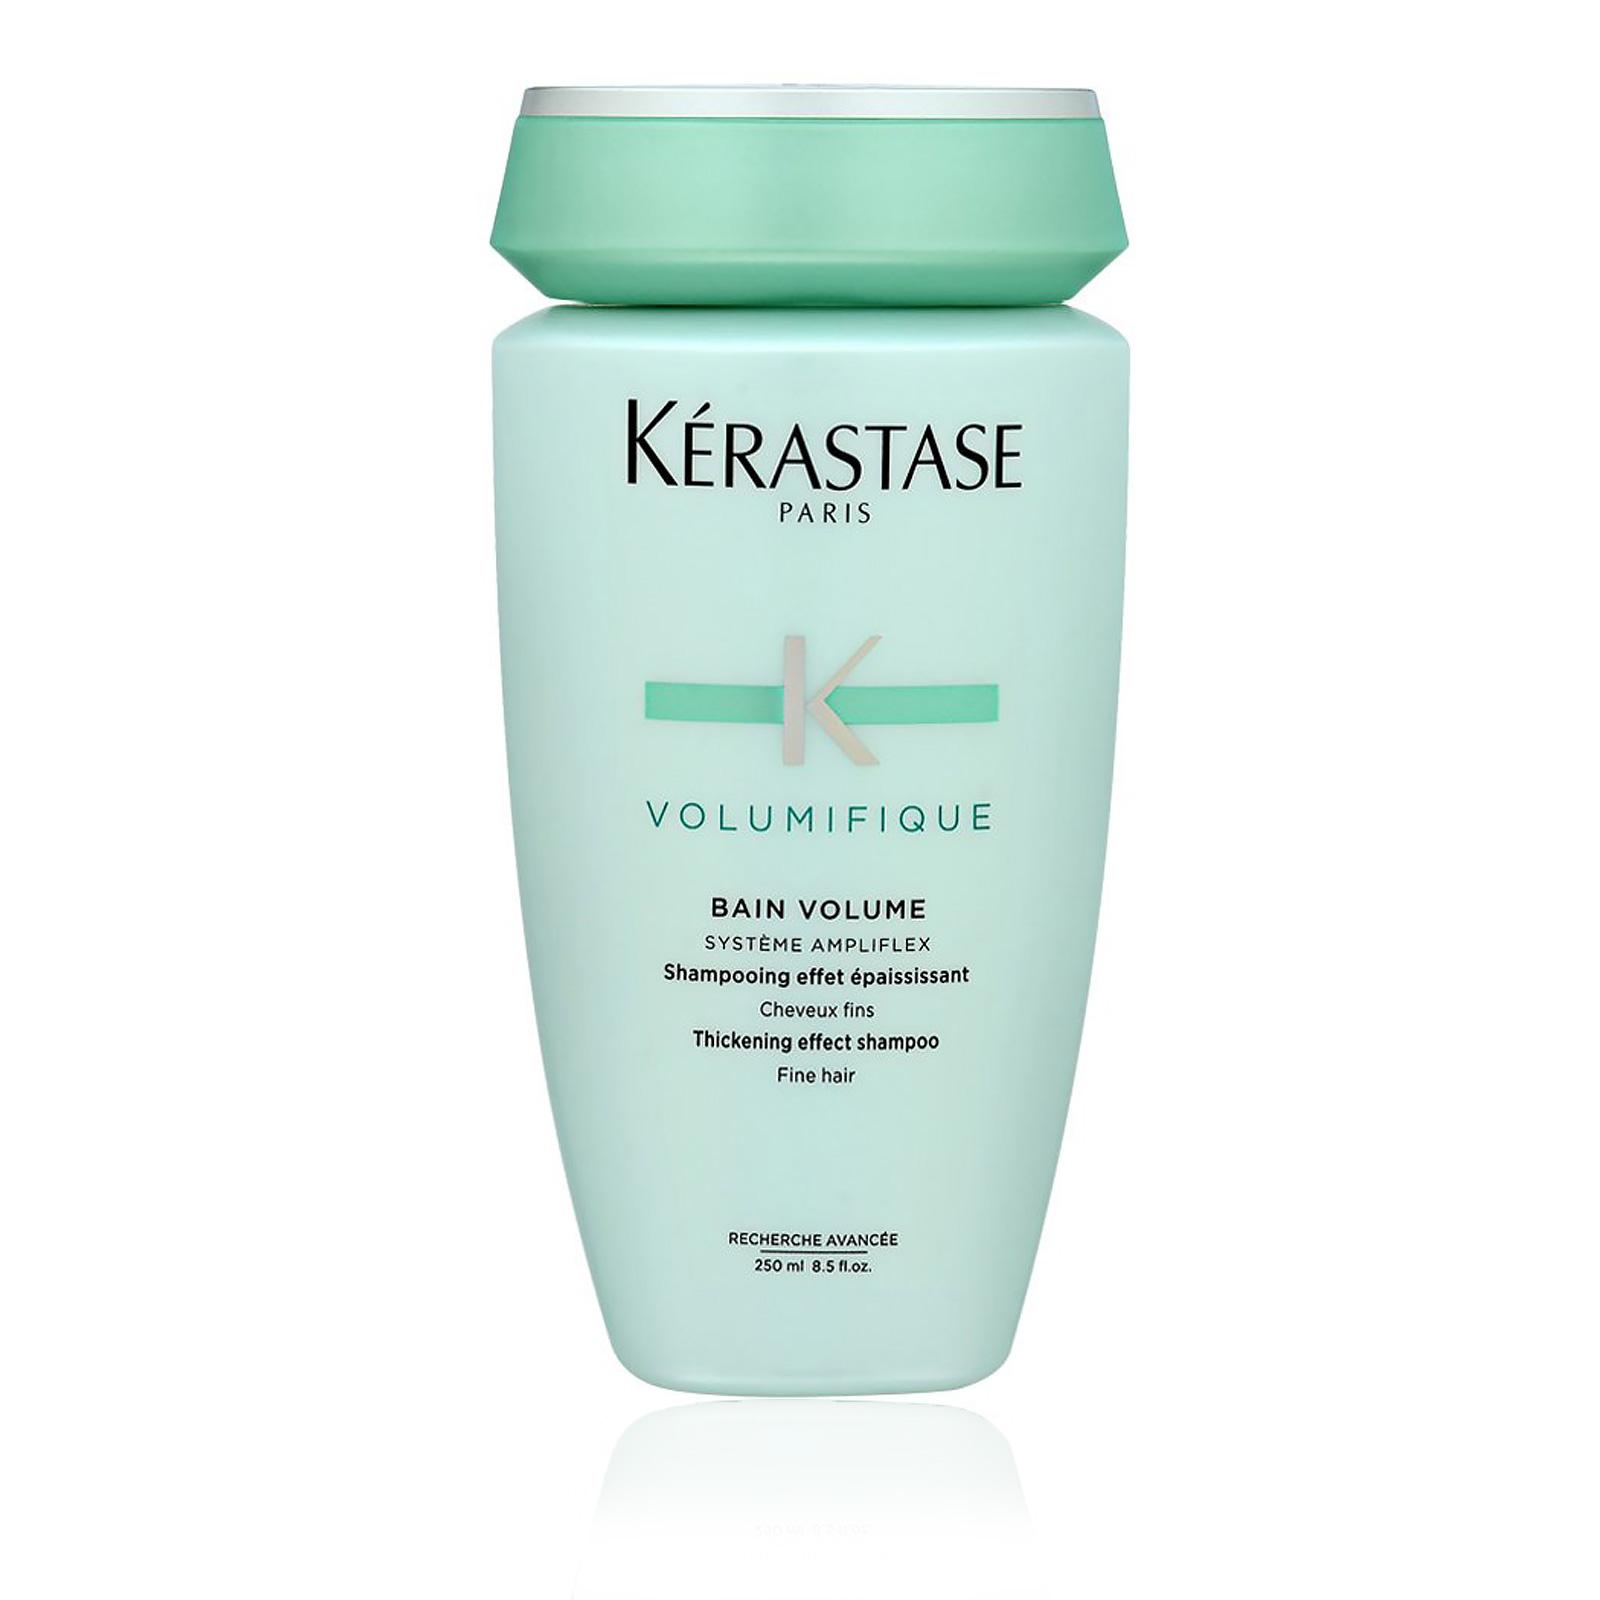 Volumifique Bain Volume Thickening Effect Shampoo (For Fine Hair)